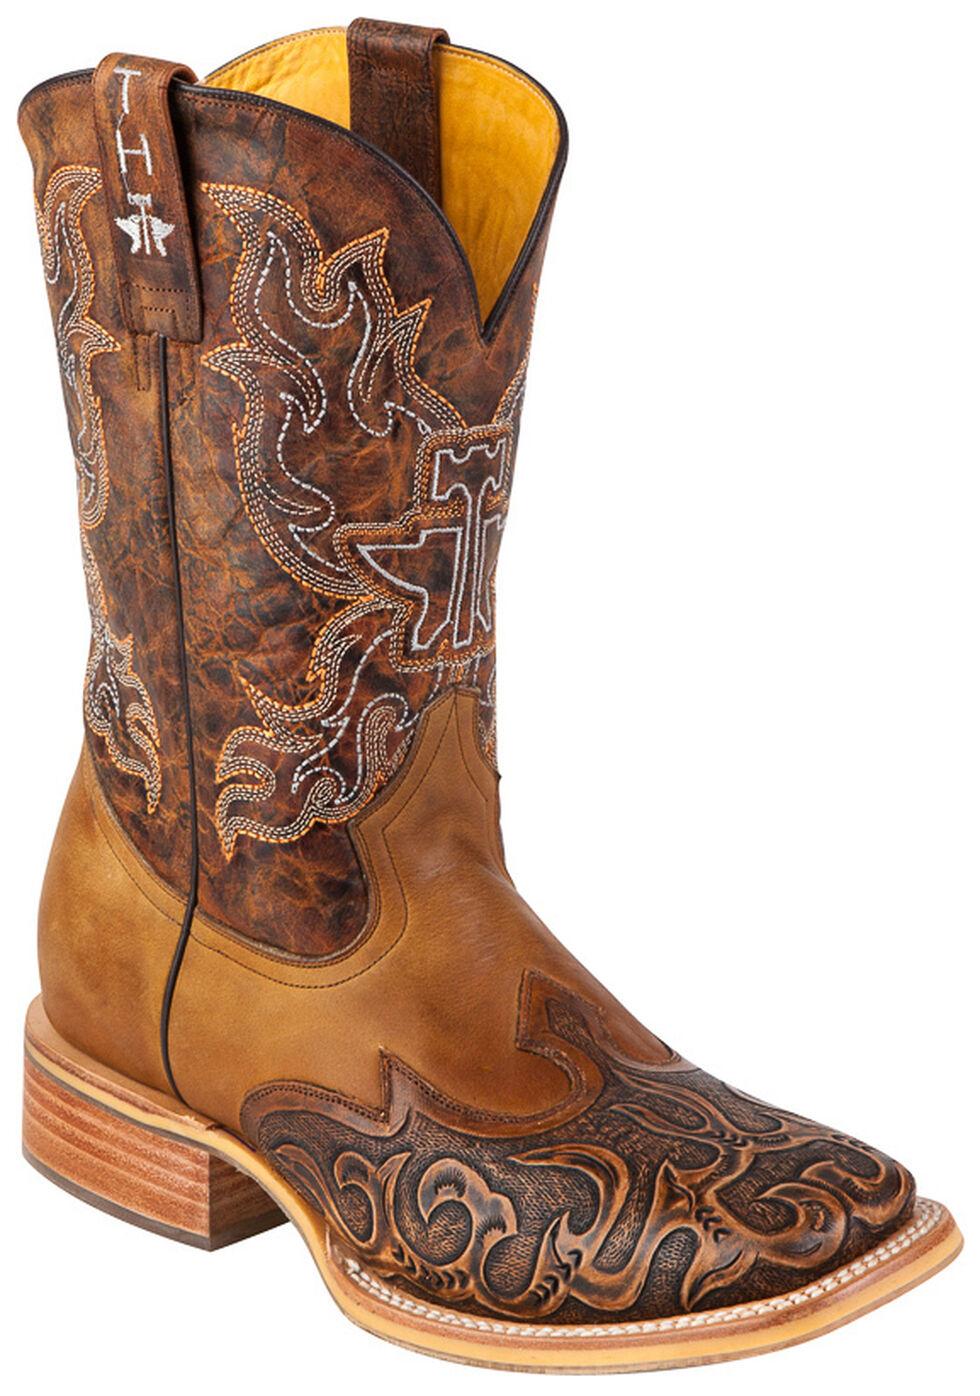 Tin Haul Smokin' Hot Rod Cowboy Boots - Square Toe, Brown, hi-res